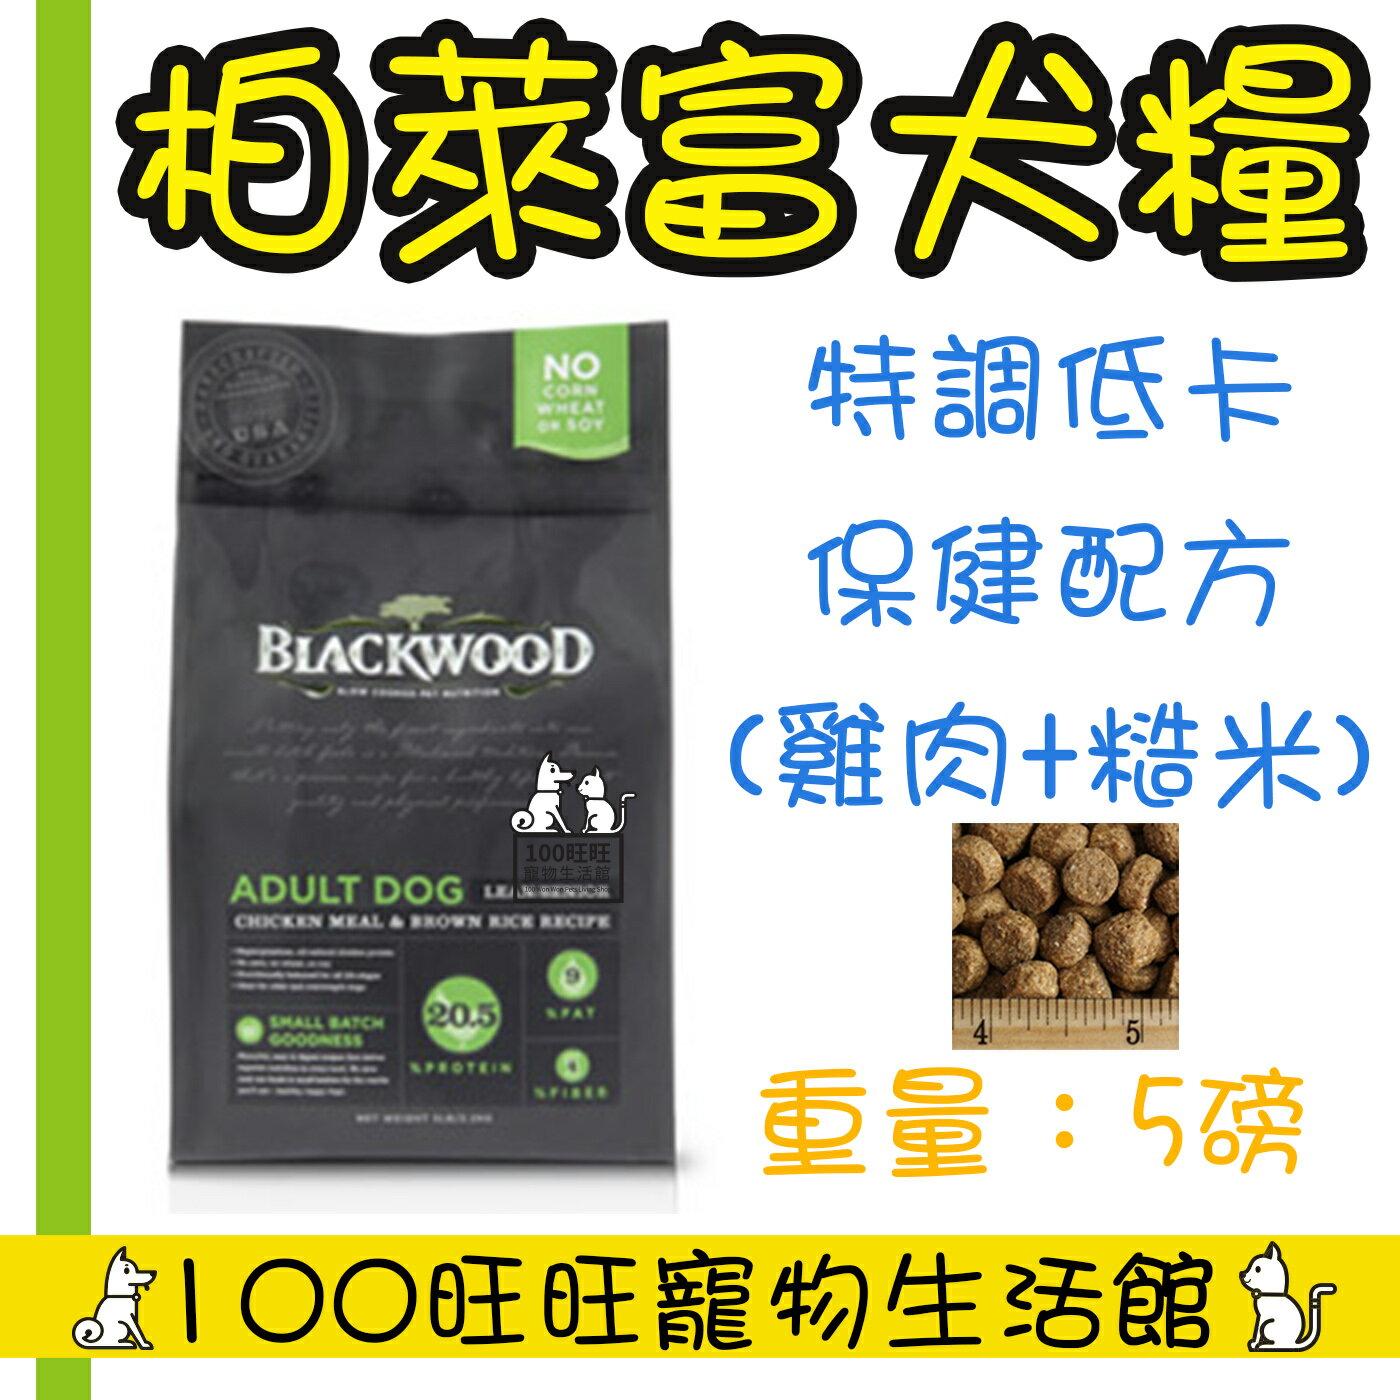 BLACKWOOD 柏萊富 特調低卡 保健配方 5lb (雞肉+糙米) 2.2kg